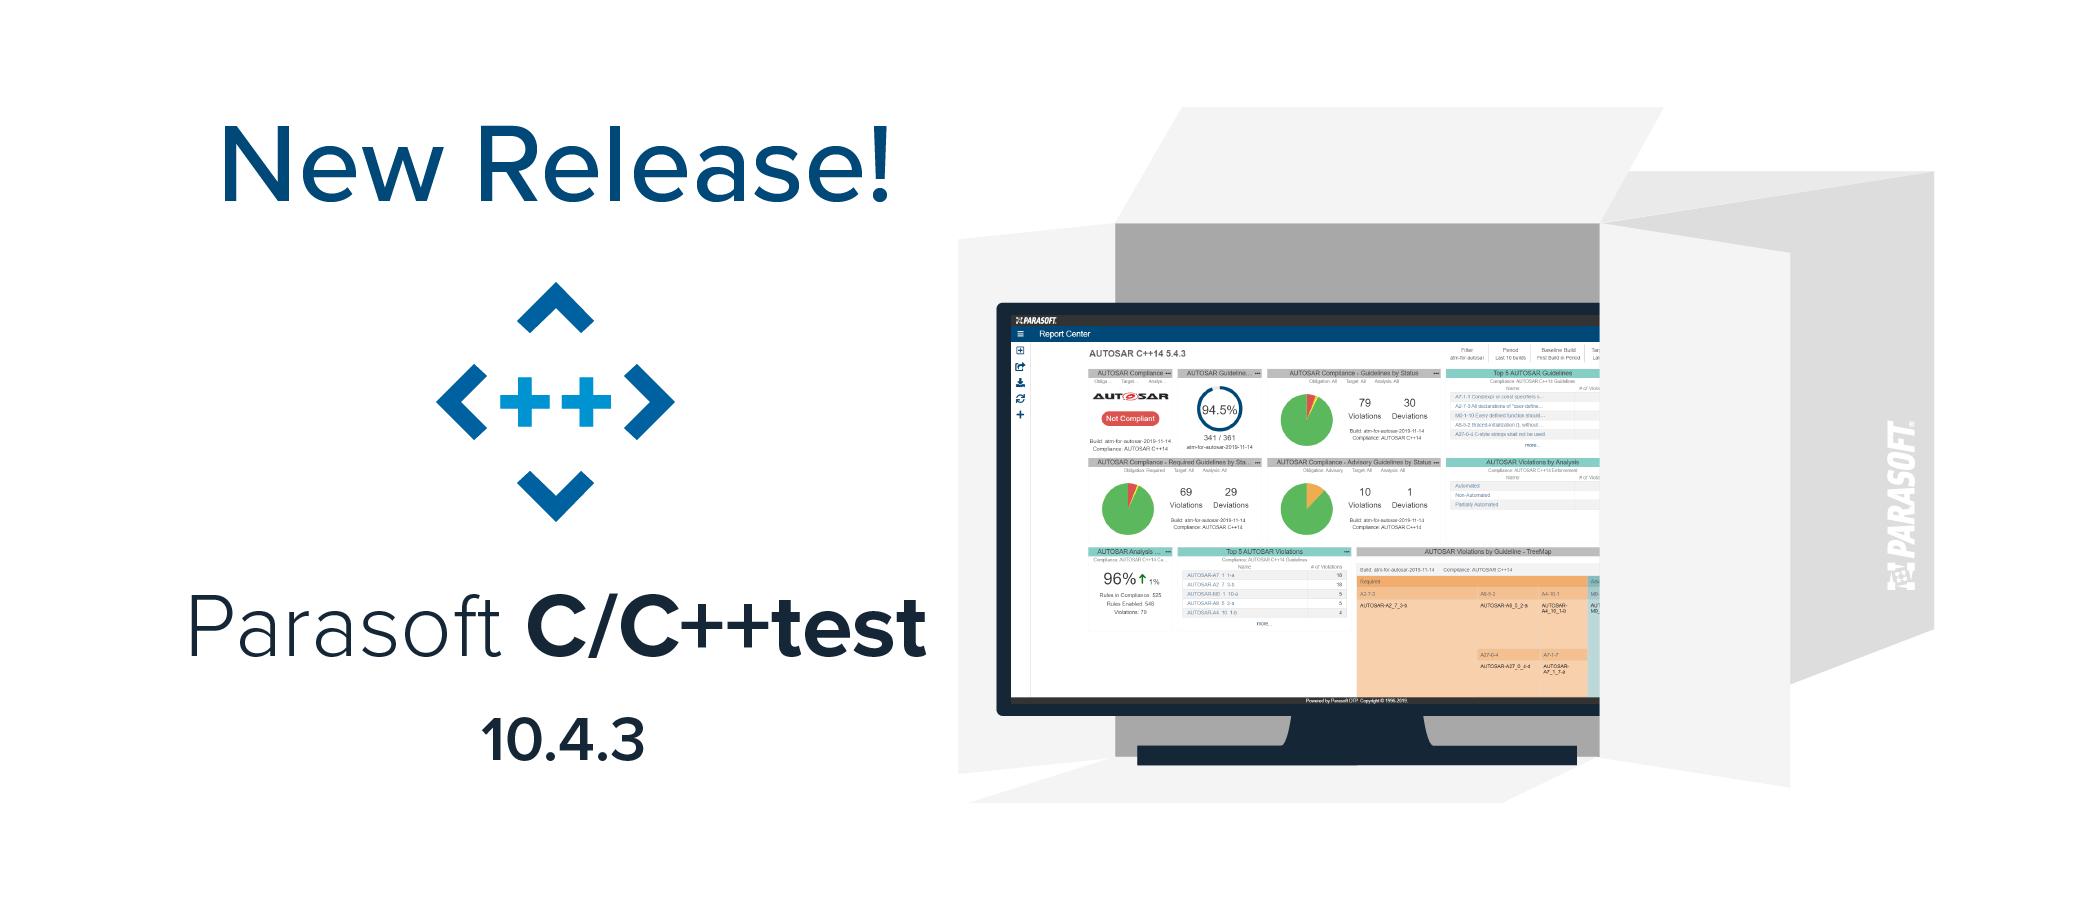 We released Parasoft C/C++test 10.4.3!